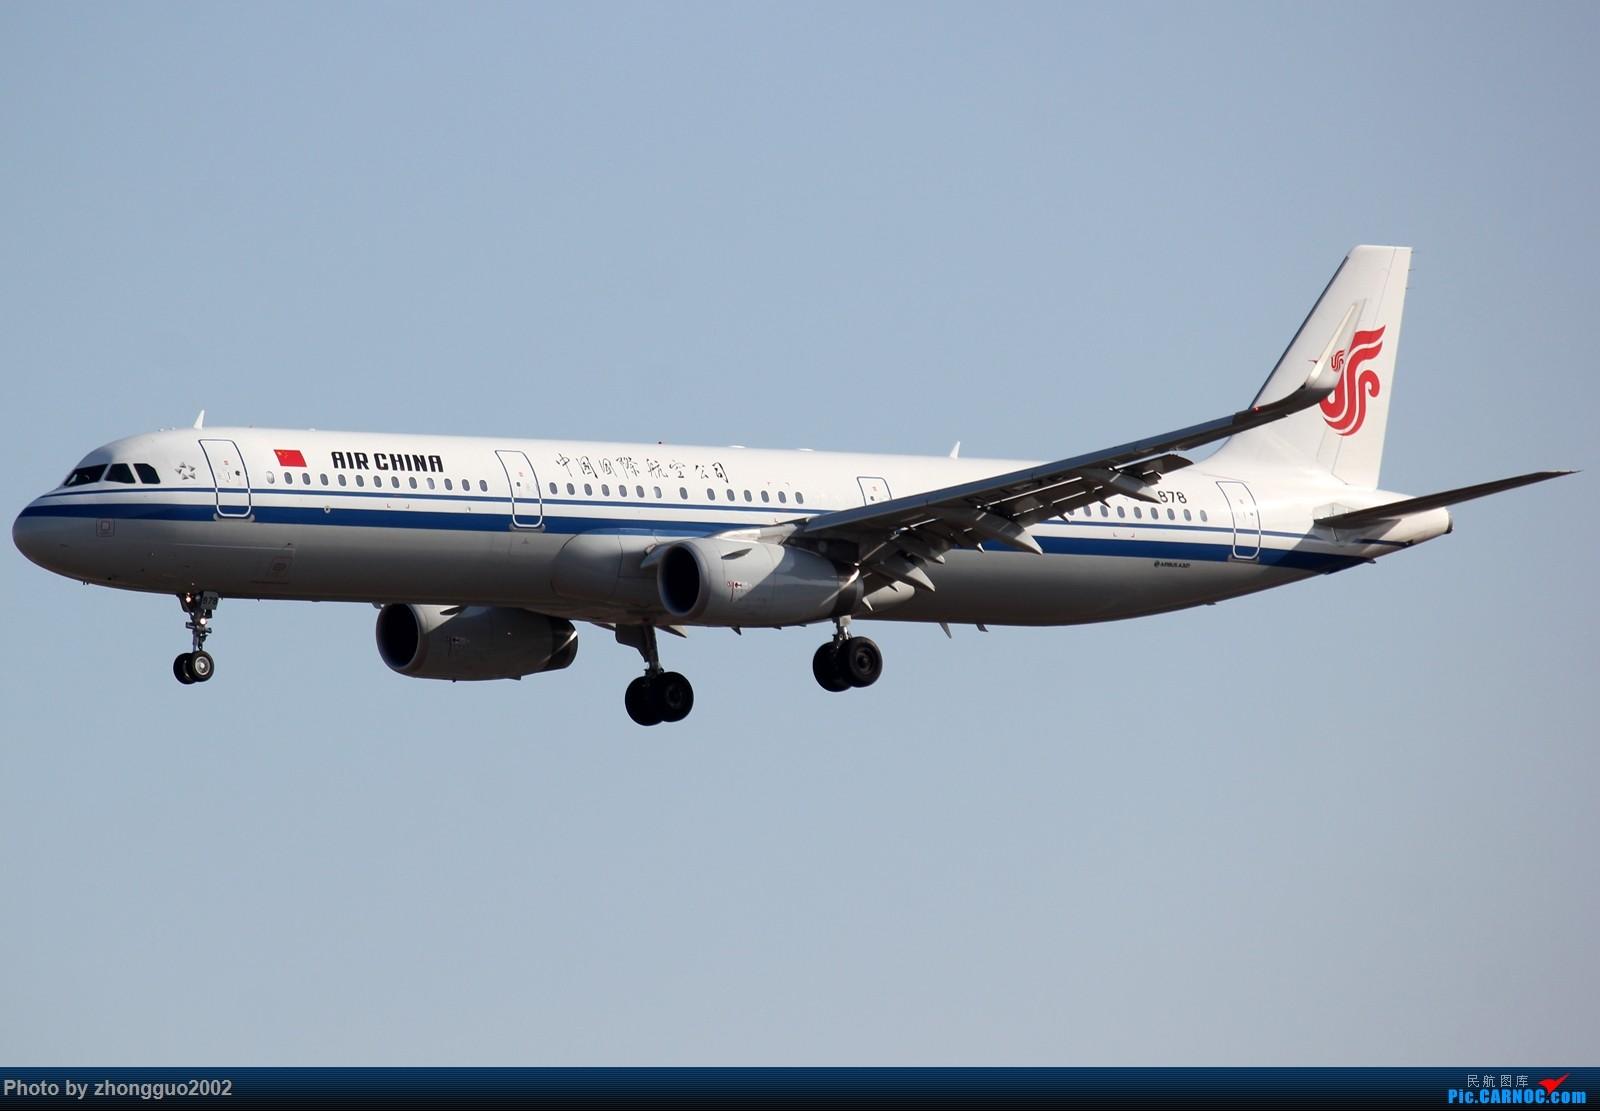 Re:[原创]【BLDDQ--深圳打机队】发小飞机盖楼贴,凡跟帖1字开头大陆民航飞机图的,每图五架小飞机不重复 AIRBUS A321-200 B-1878 中国北京首都国际机场